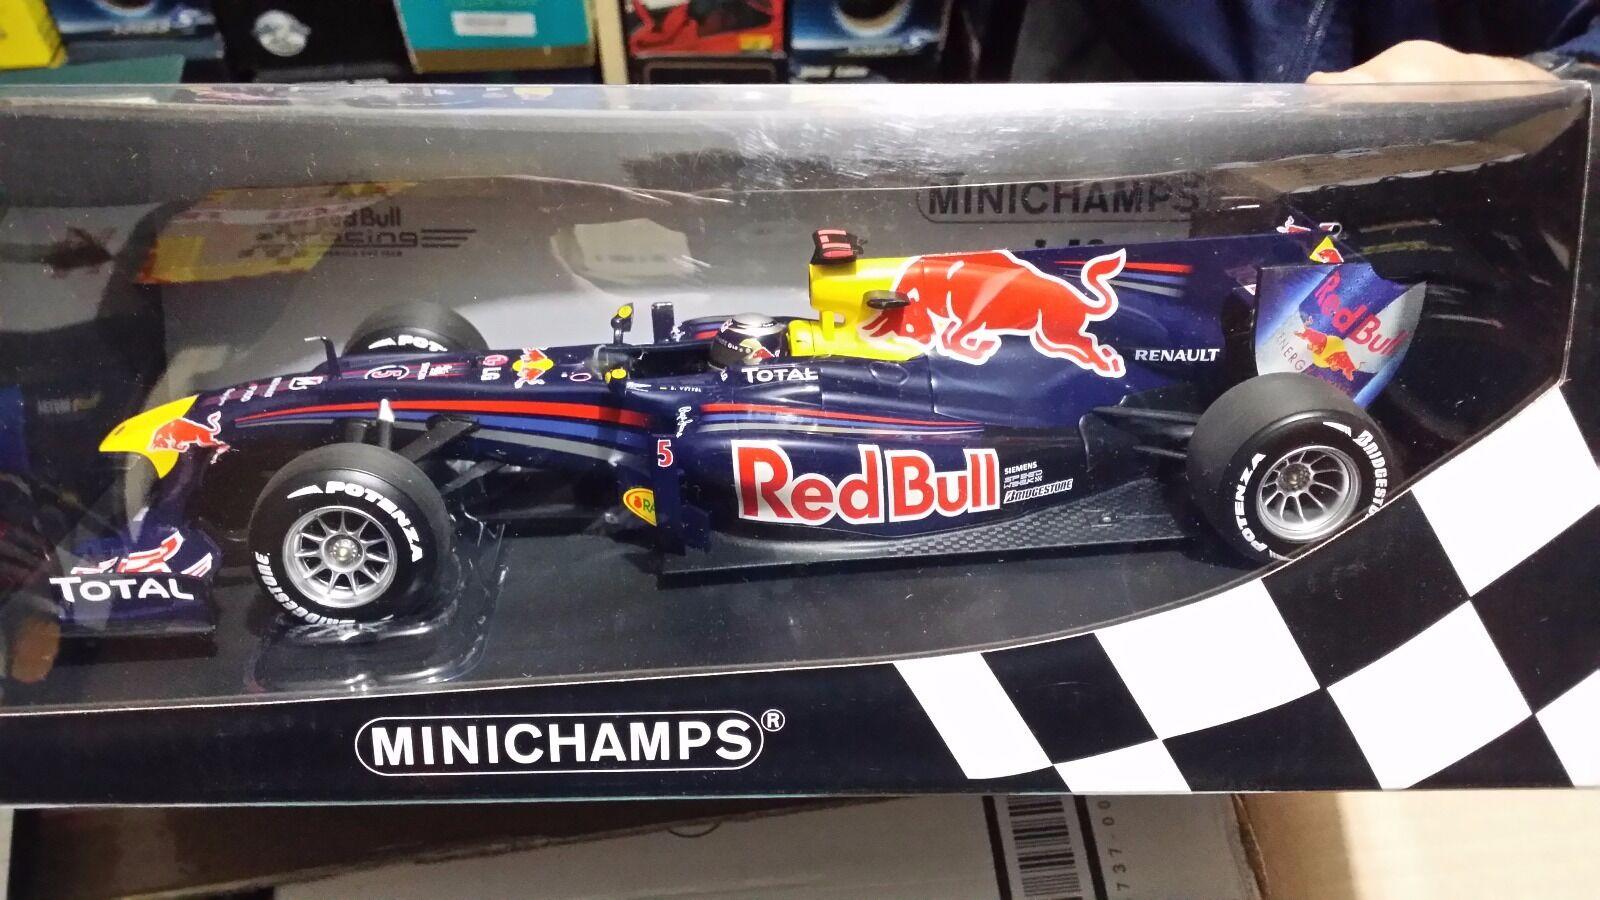 rojo Bull Rb-6 (World Champion Vettel) 2010 Minichamps 1 18